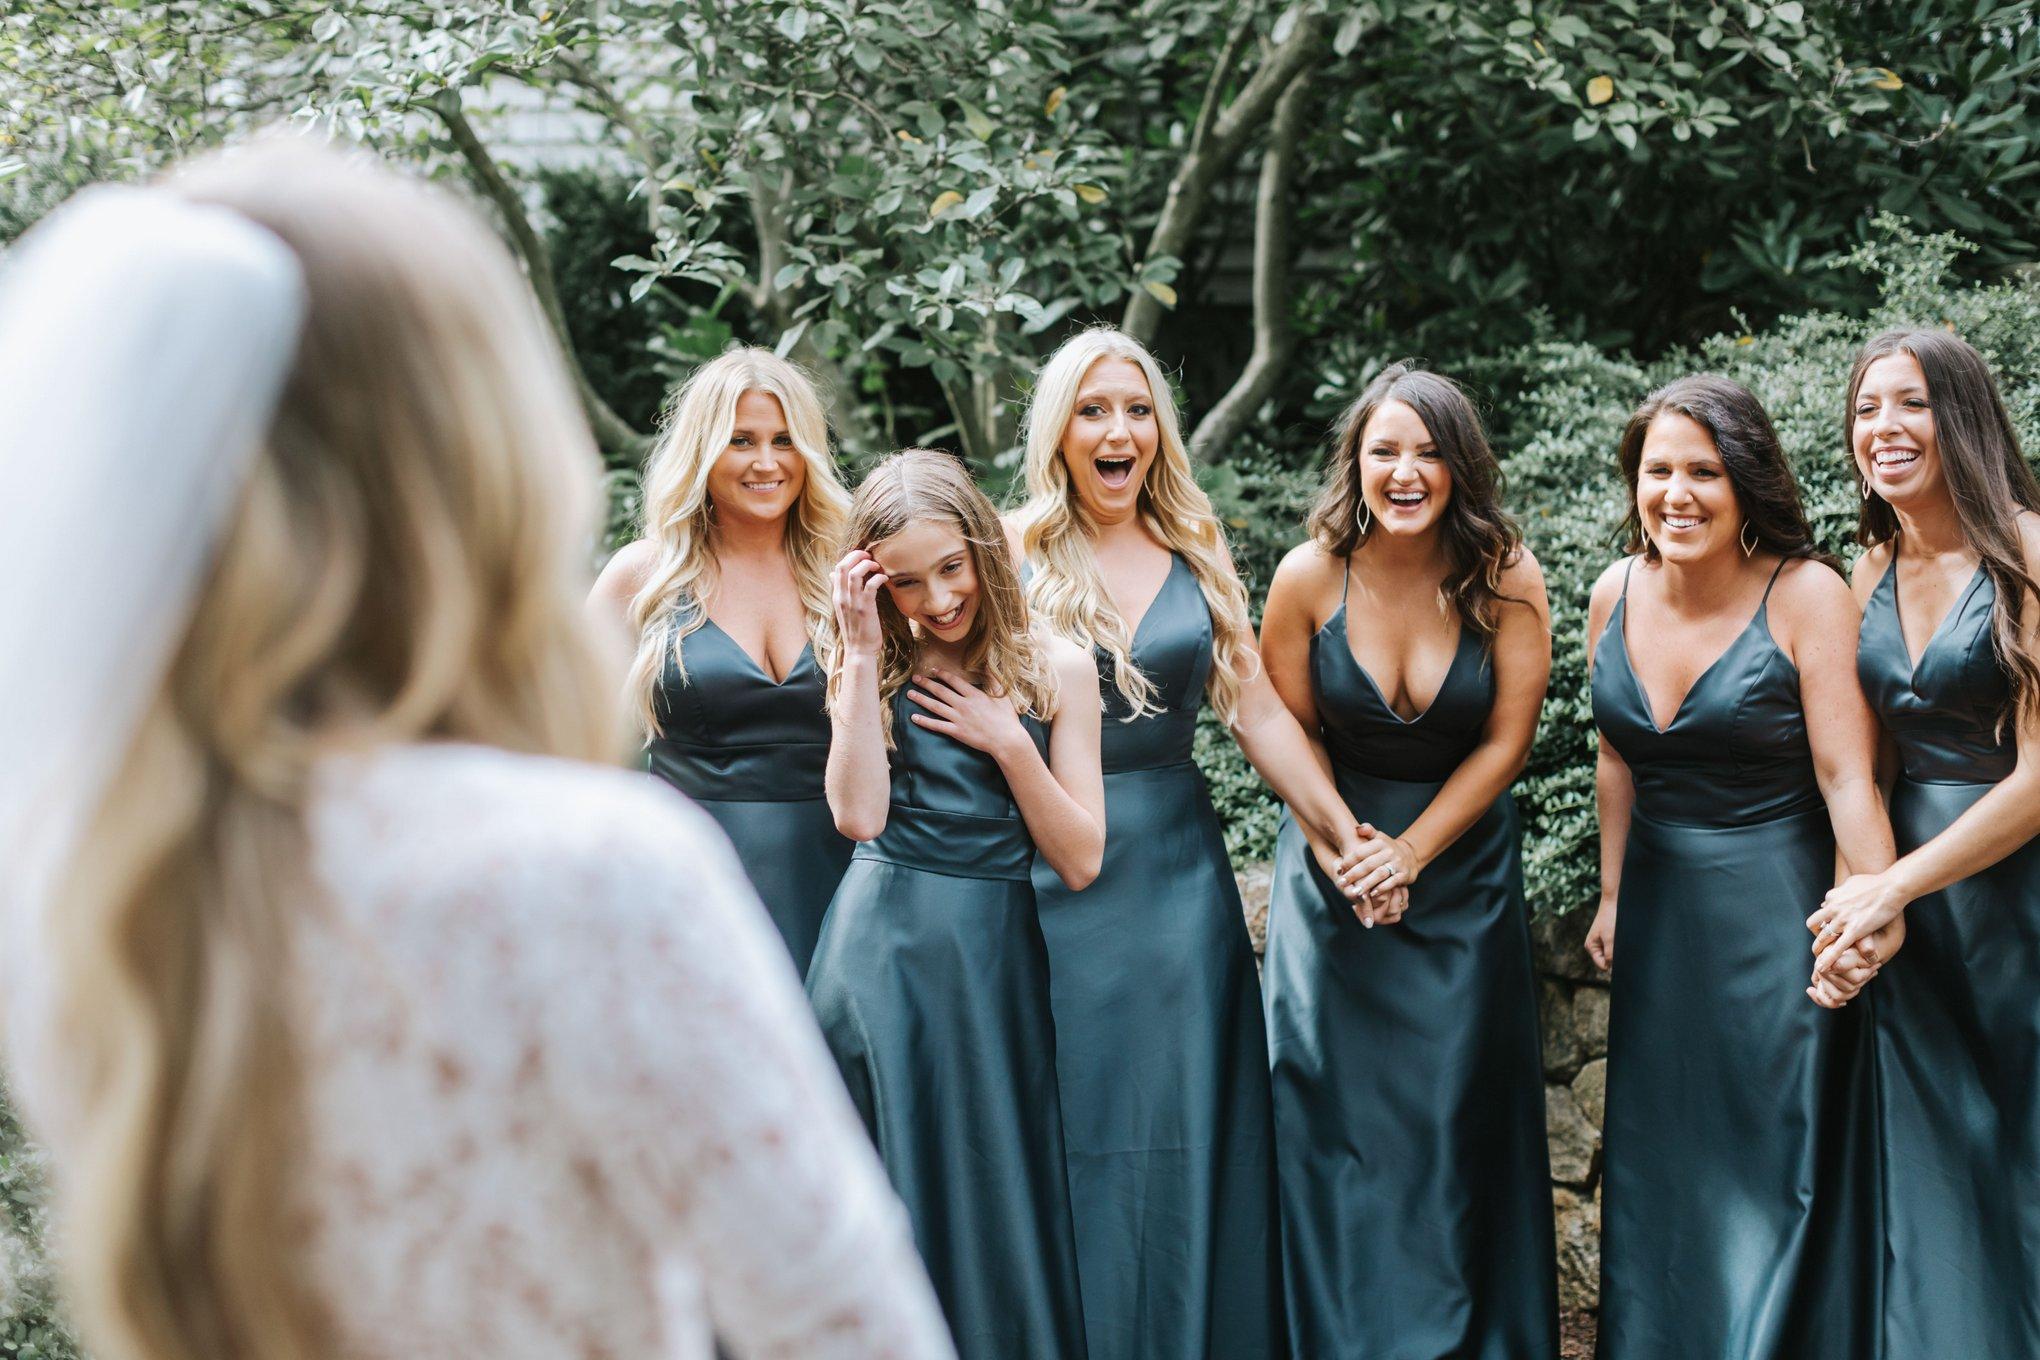 Wequassett-Wedding-Photographer-Cape-Cod-Boston-Lena-Mirisola-5.jpg